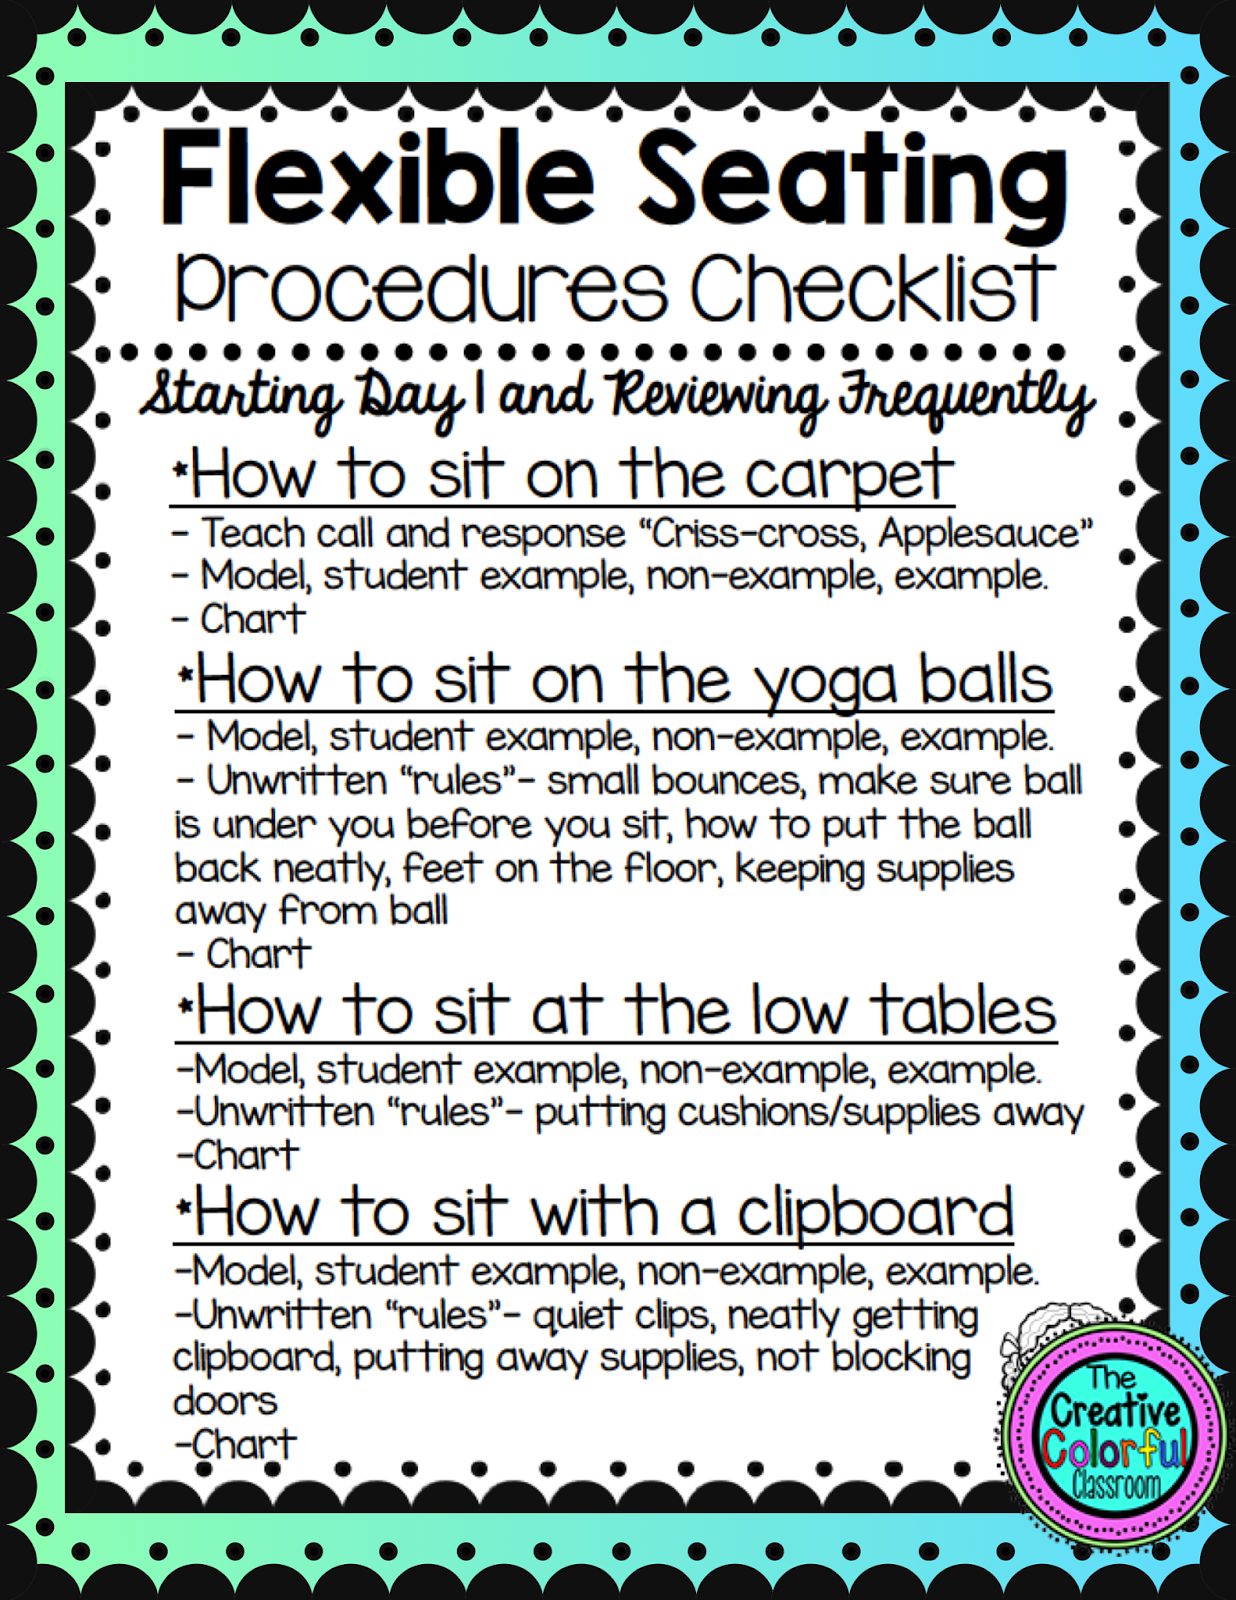 Classroom procedures classroom organization classroom management - The Creative Colorful Classroom Flexible Seating Procedures